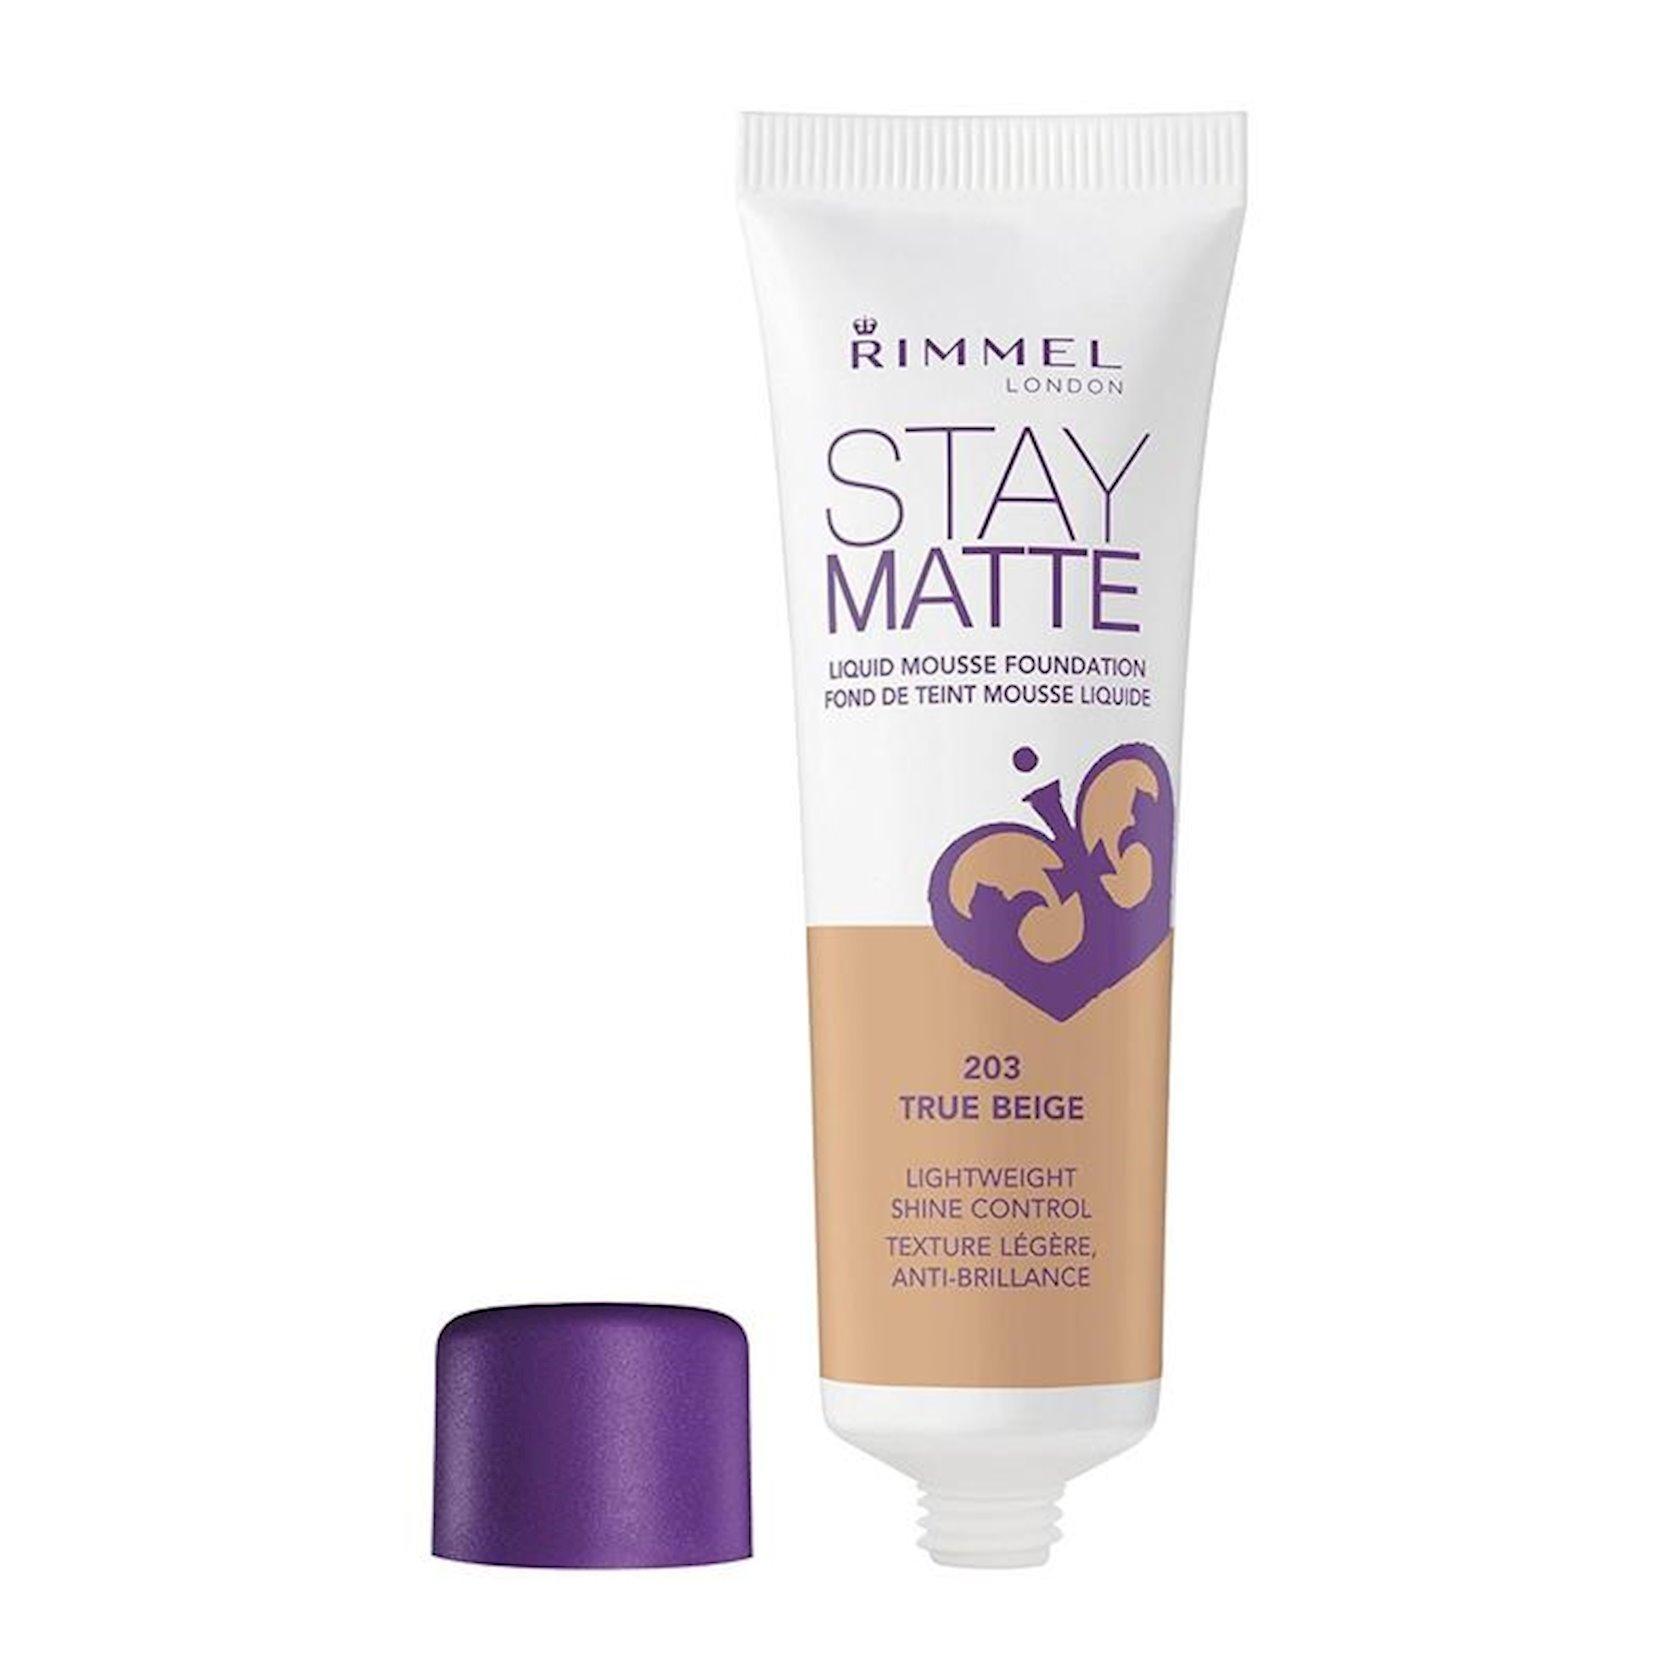 Tonal krem Rimmel Stay Matte Liquid Mousse Foundation  ton 203 True Beige 30 ml